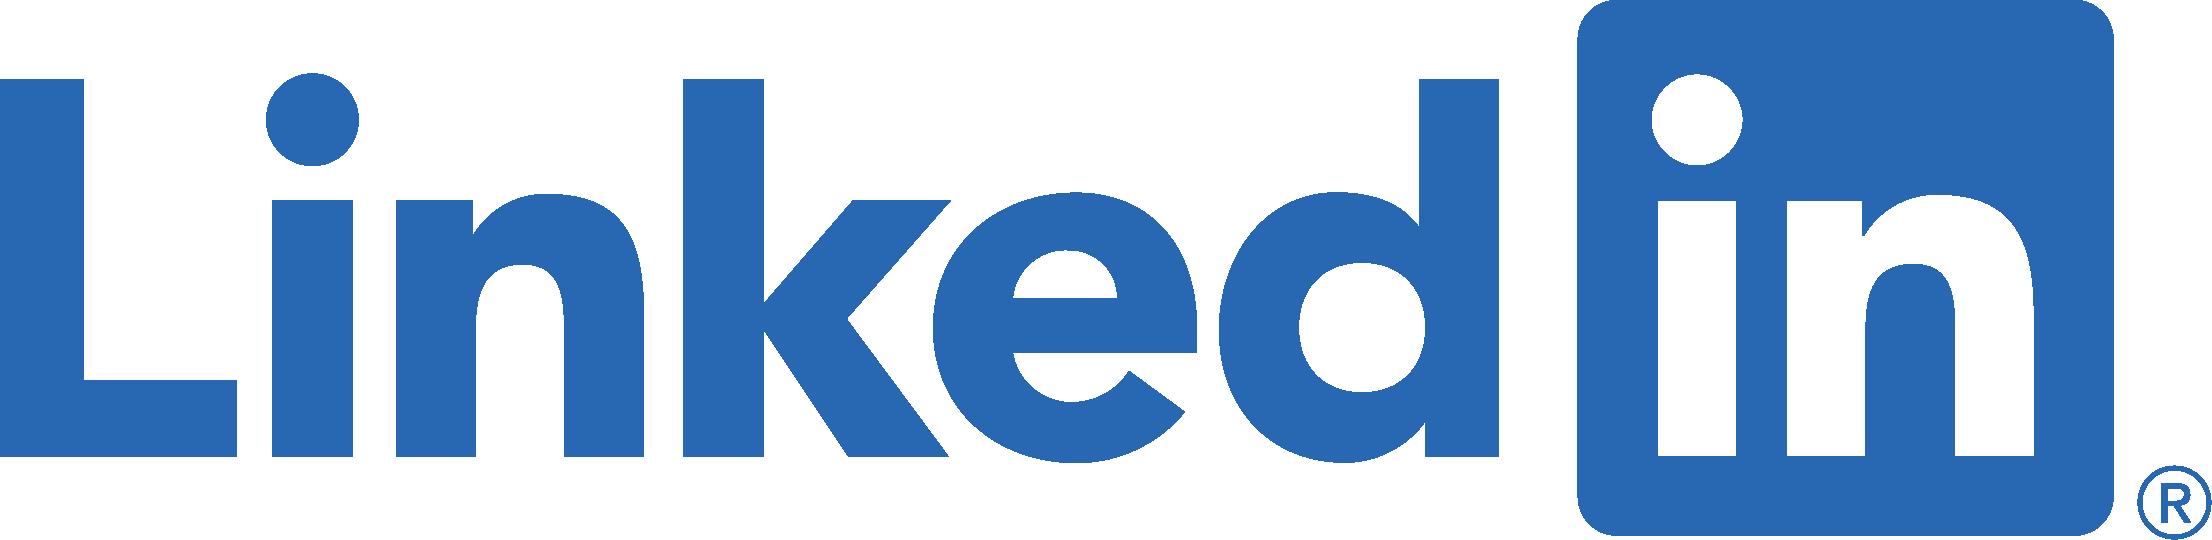 LinkedIn_Aktuelle Nutzerzahlen